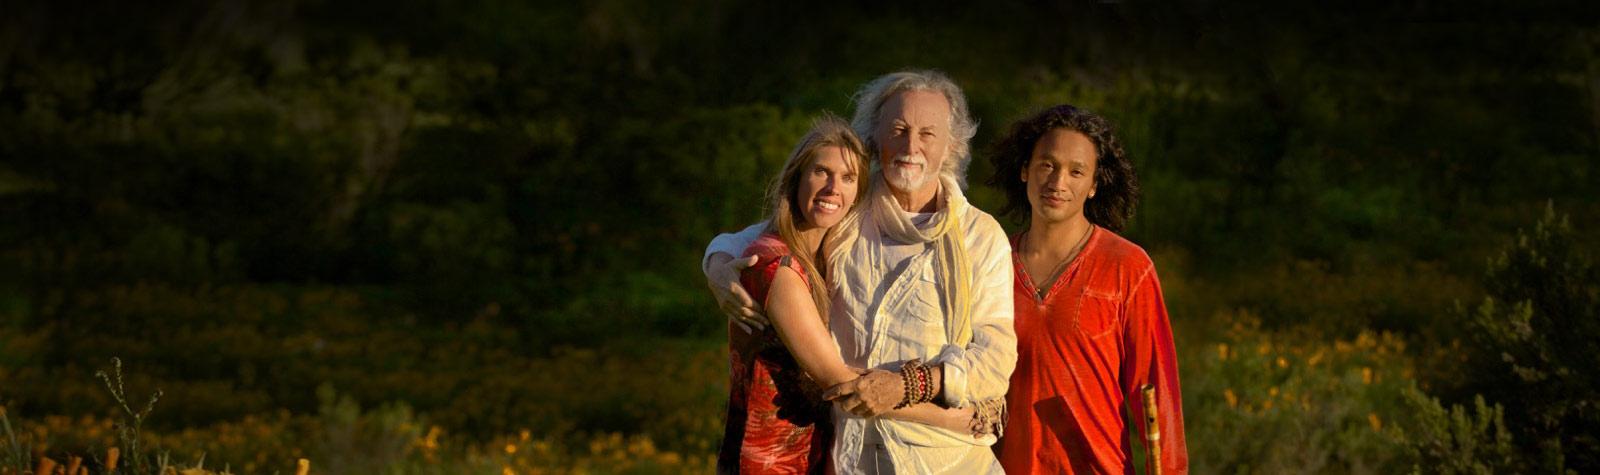 The Medicine of Mantra – Episode 2